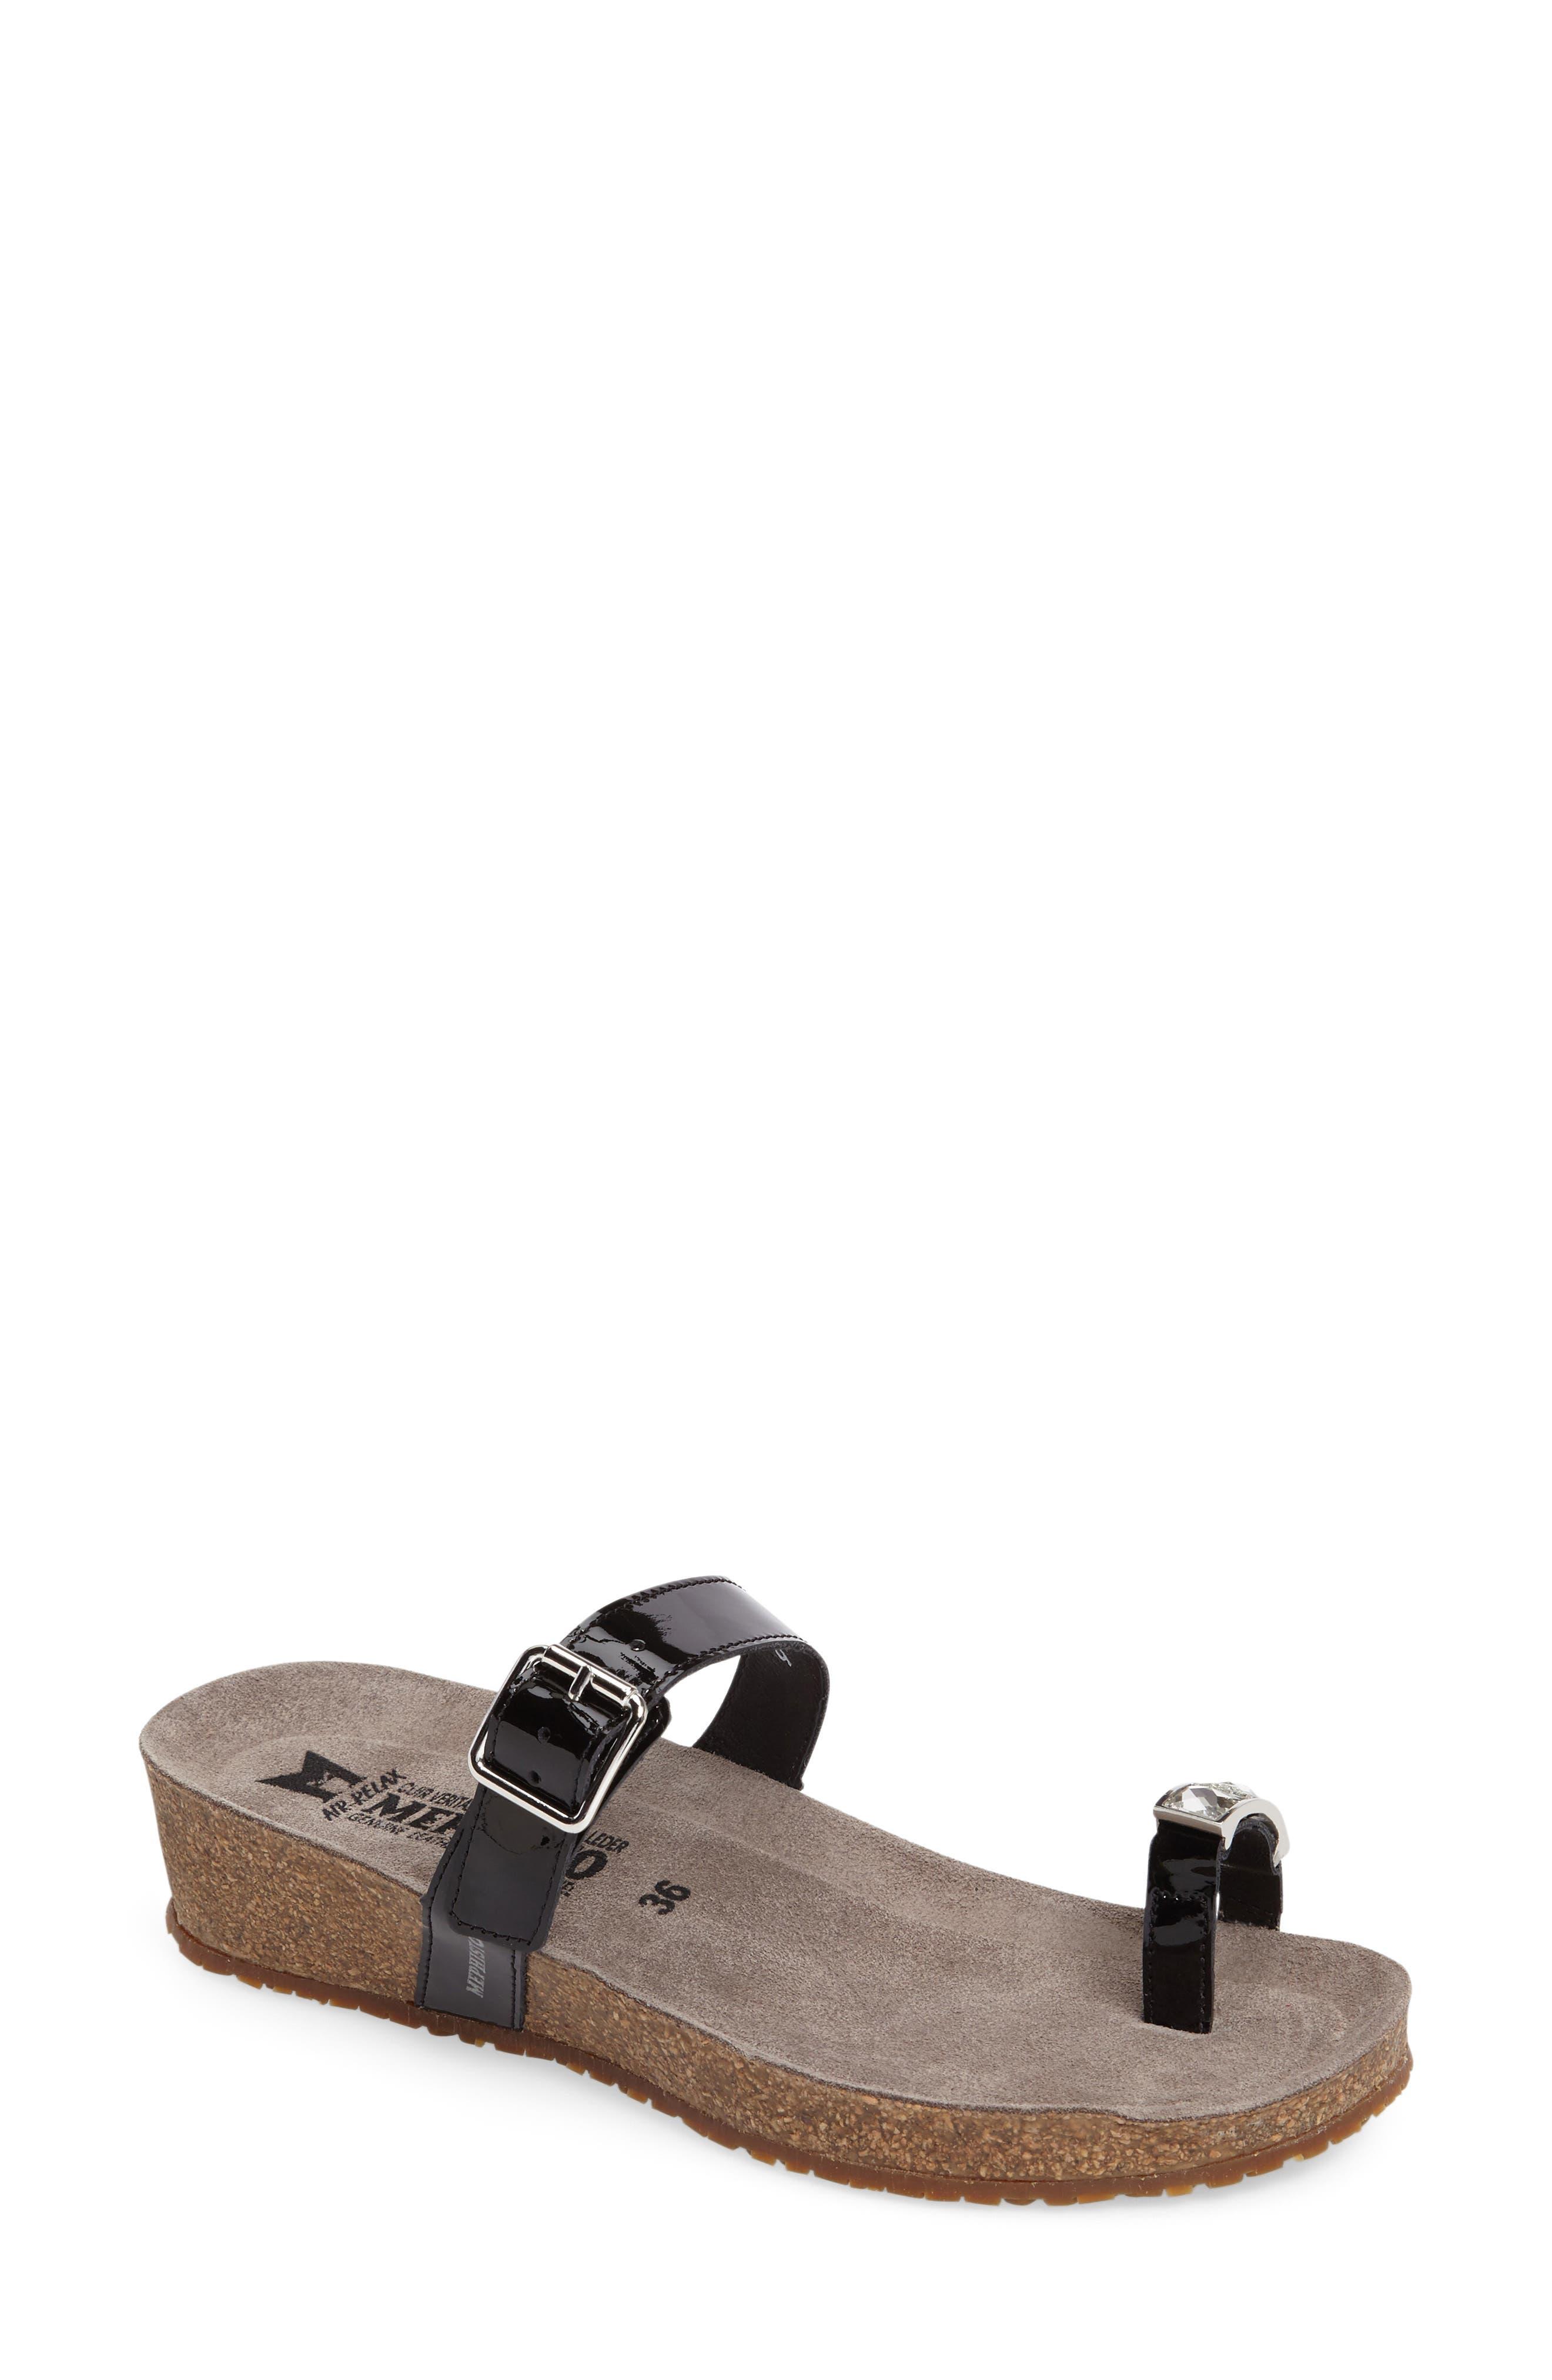 Ilaria Embellished Wedge Sandal,                         Main,                         color, Black Patent Leather